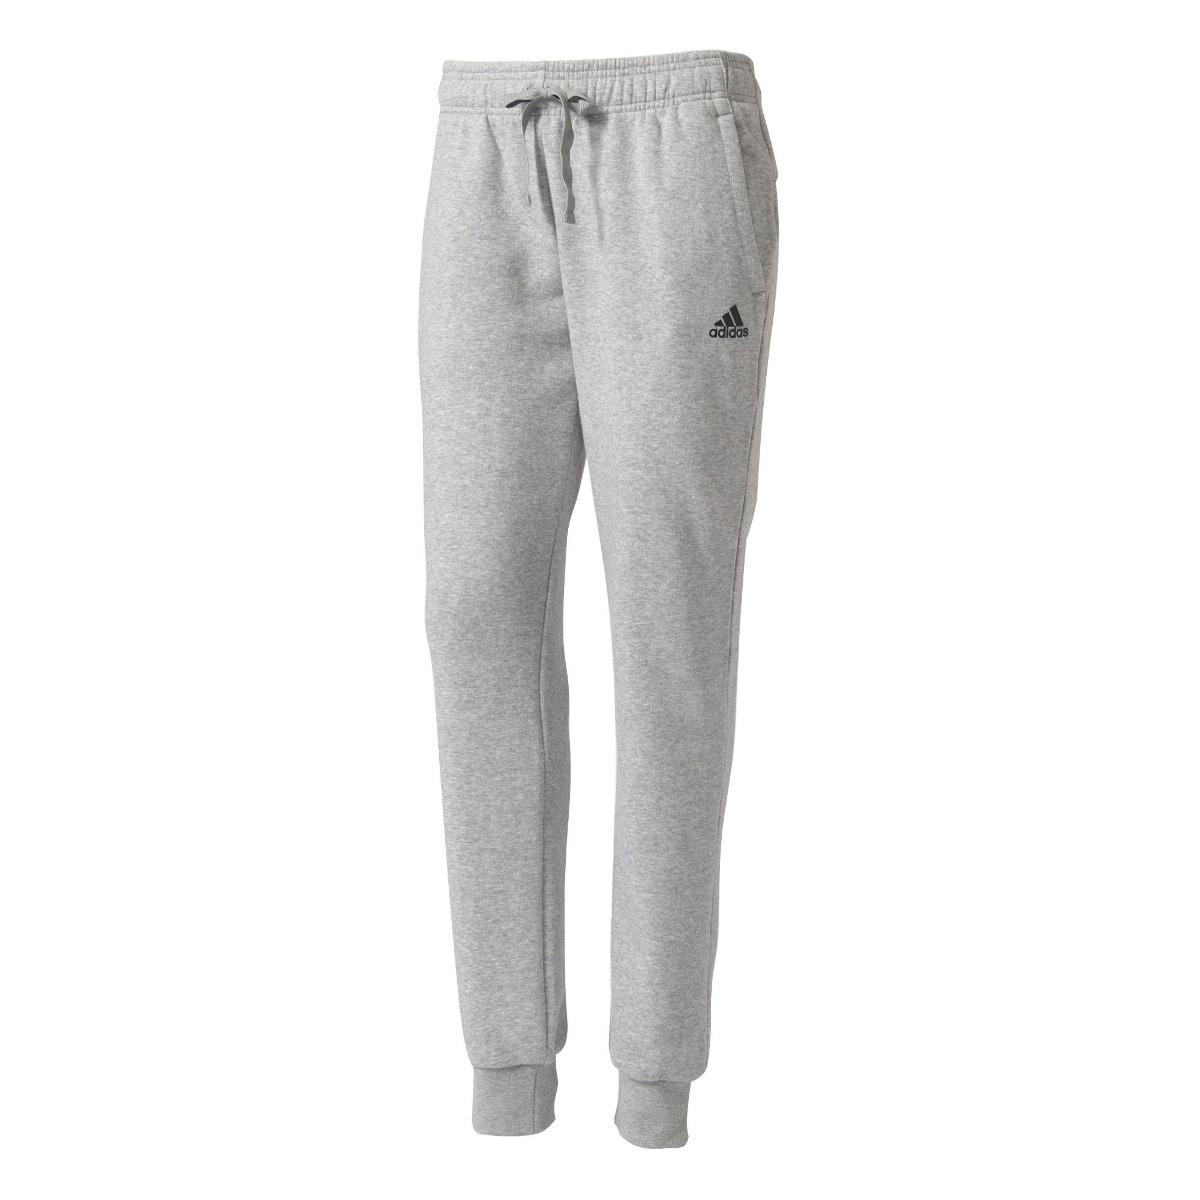 calça adidas solid essentials feminina. Carregando zoom. fd41f3ebcd3